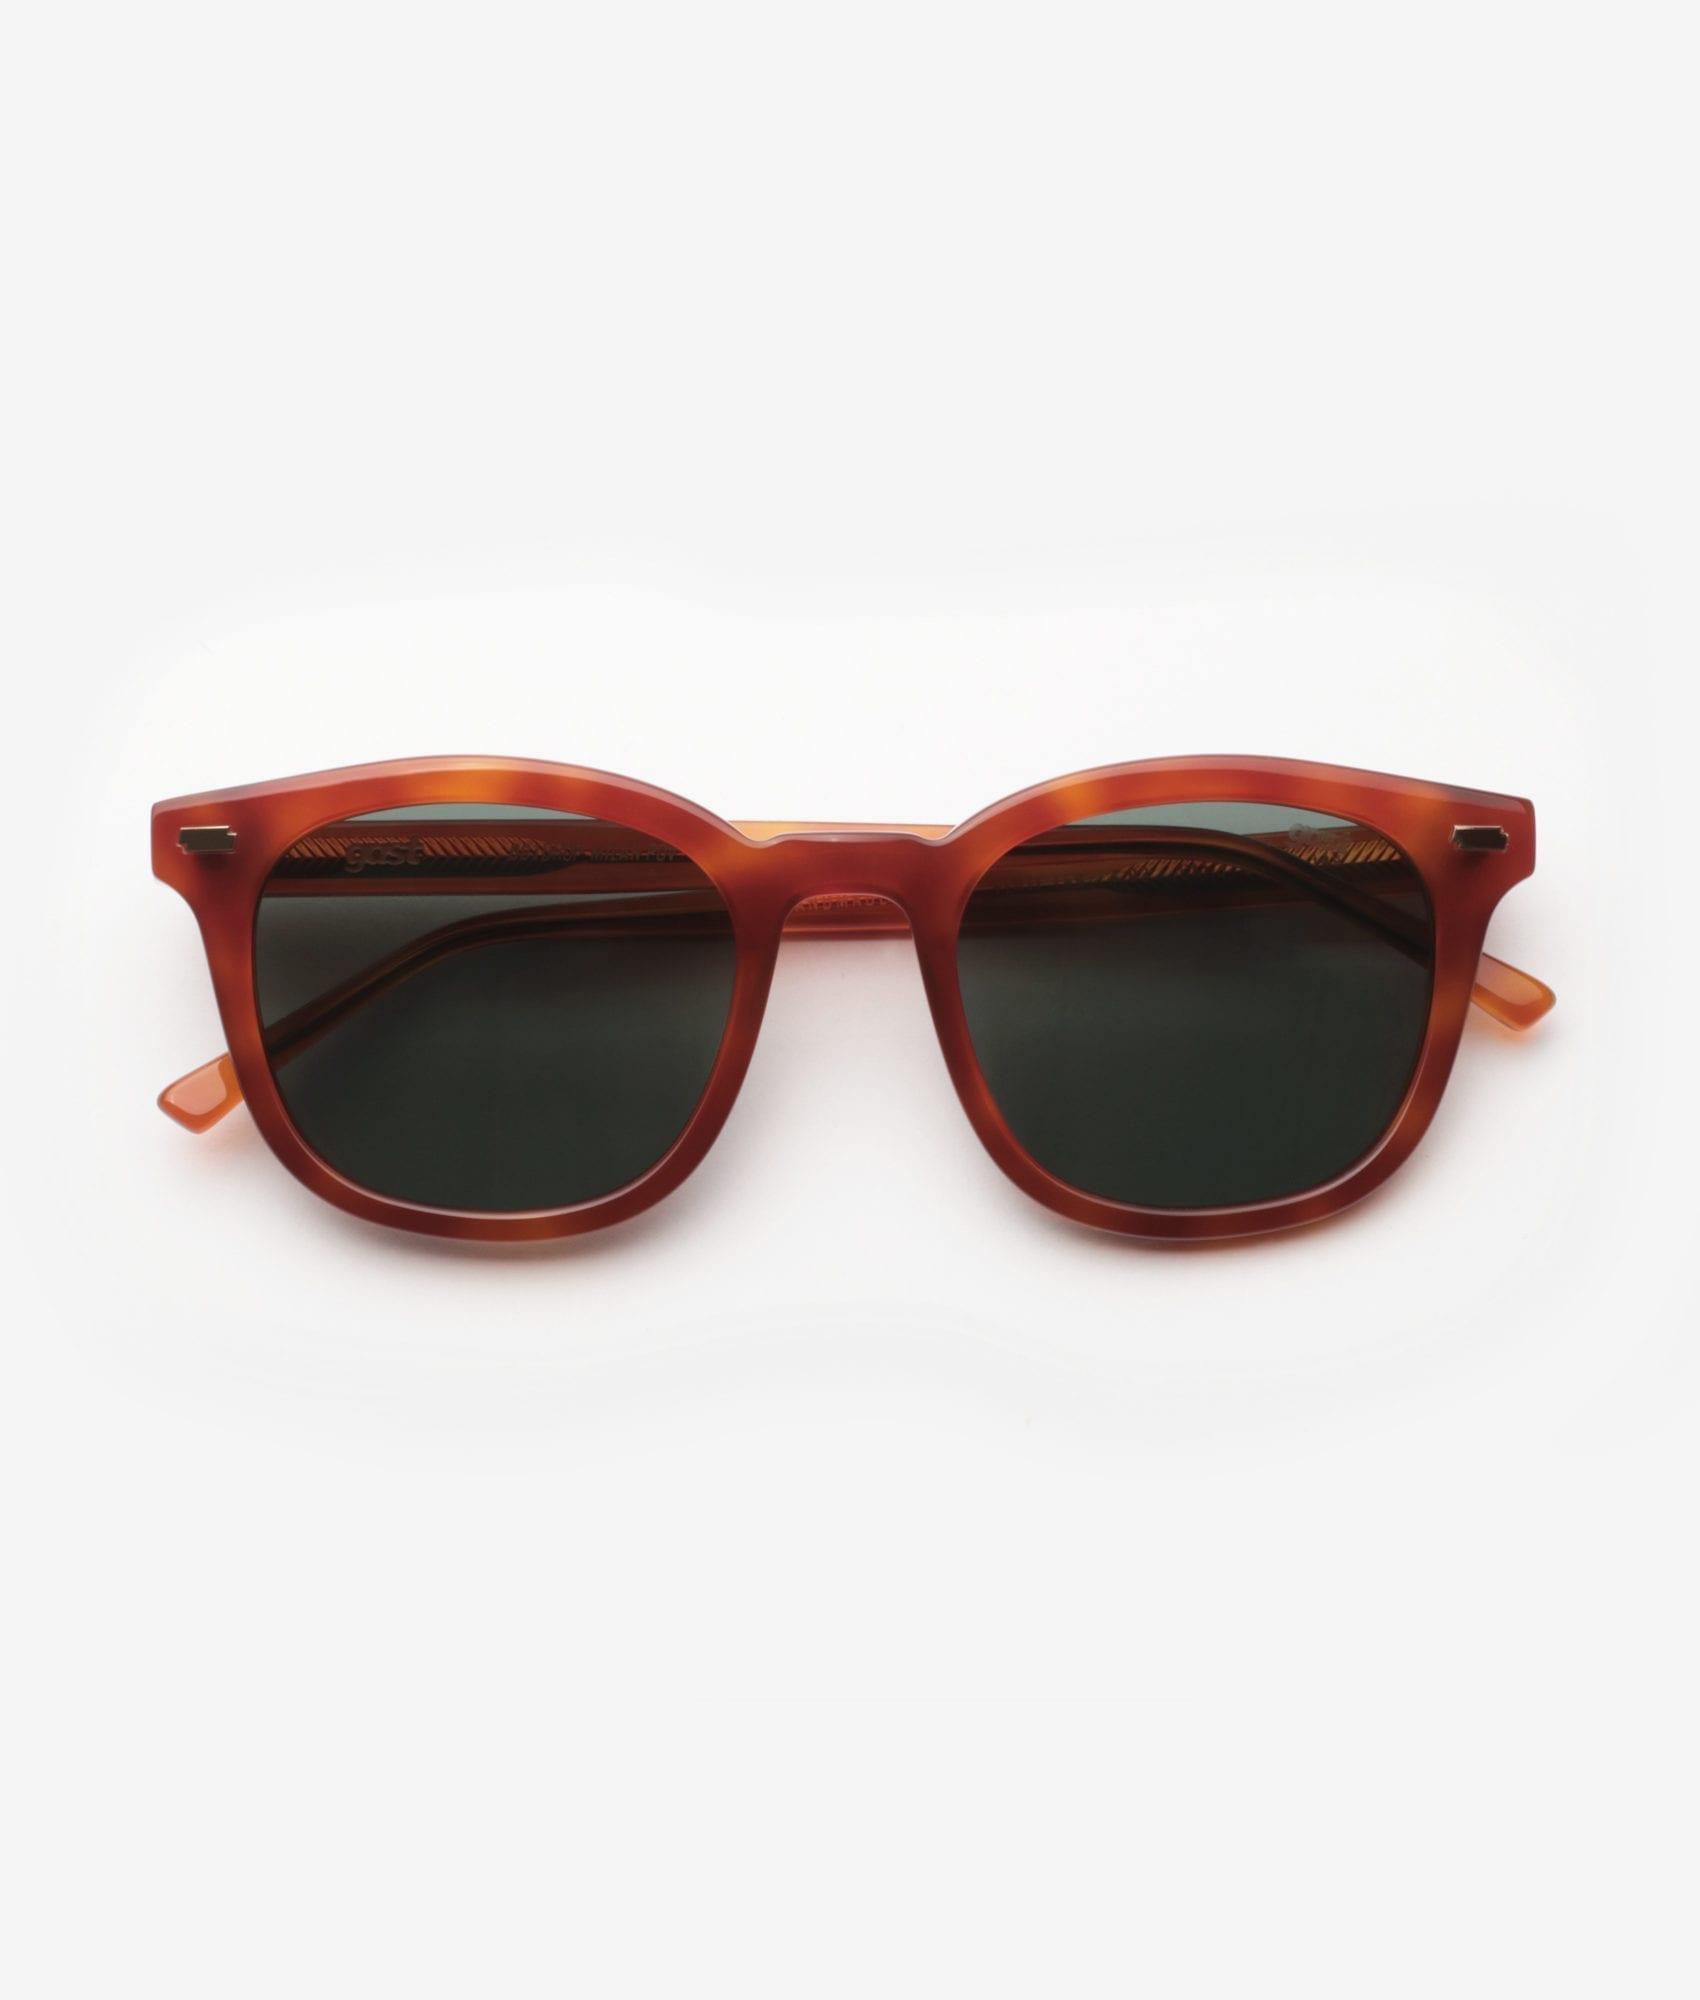 VENTI 159 Havana Gast Sunglasses